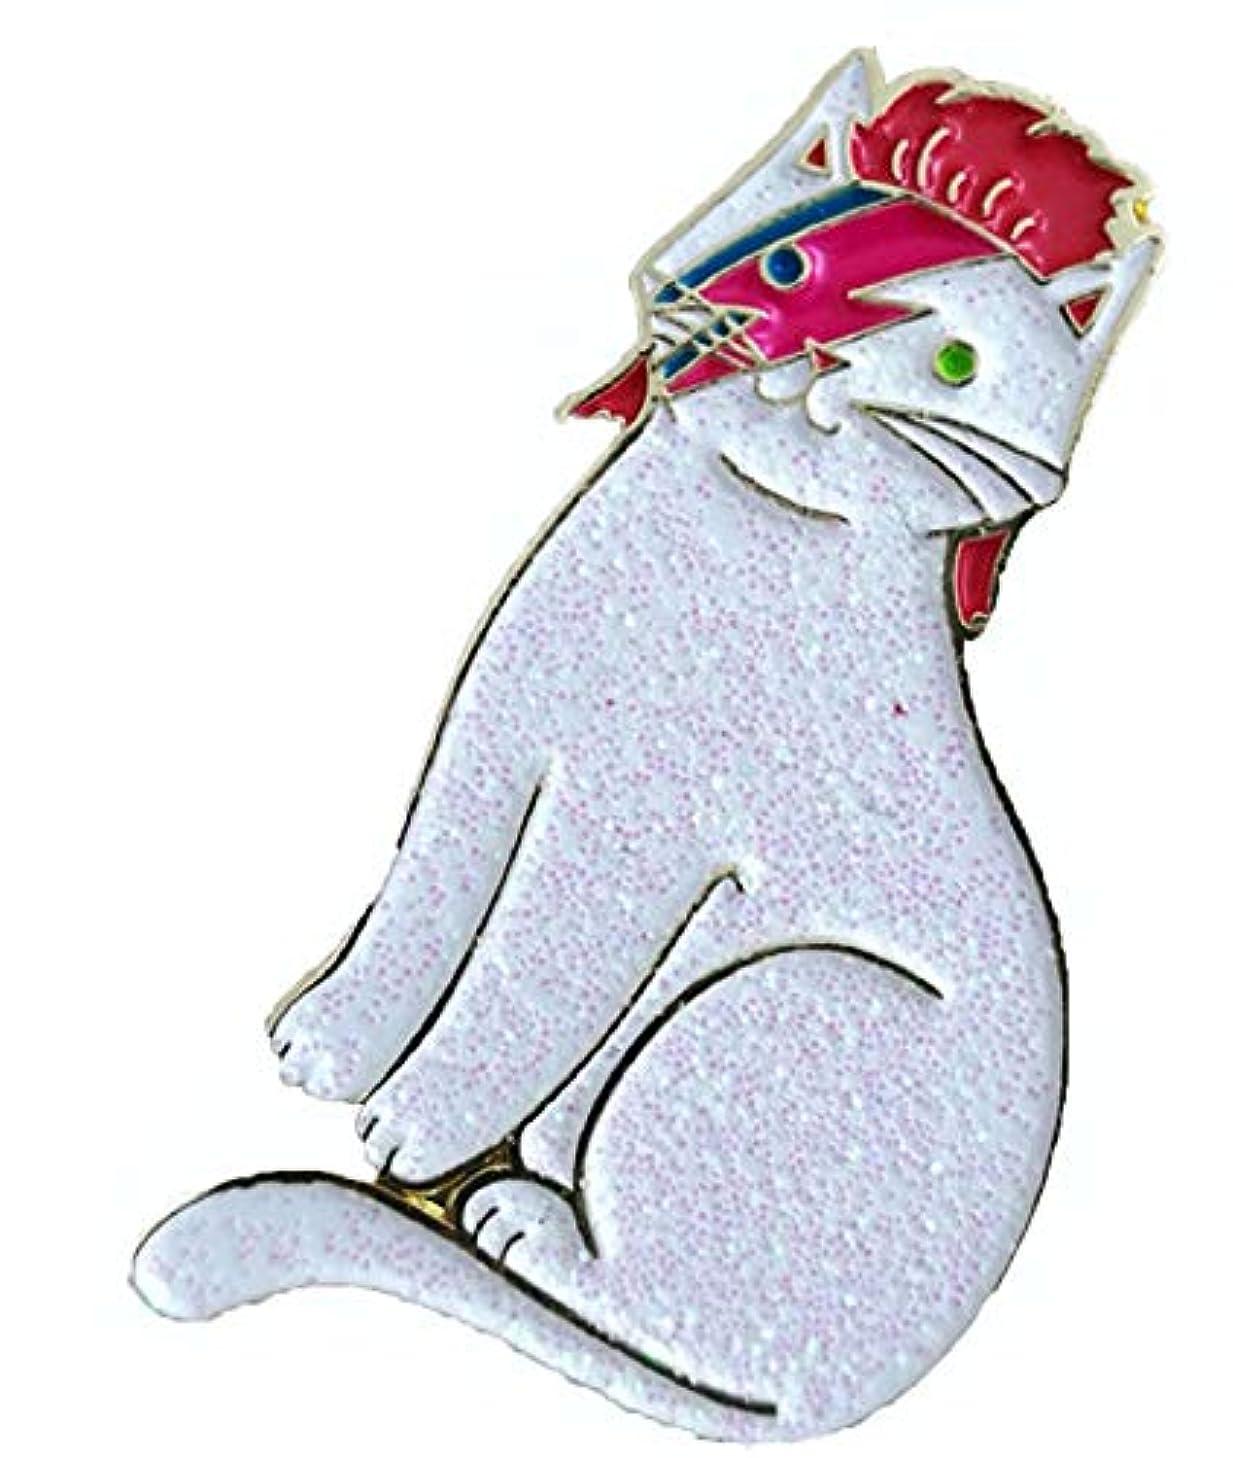 FTH Aladdin Sane David Bowie Lightening Bolt CAT Enamel 1.25